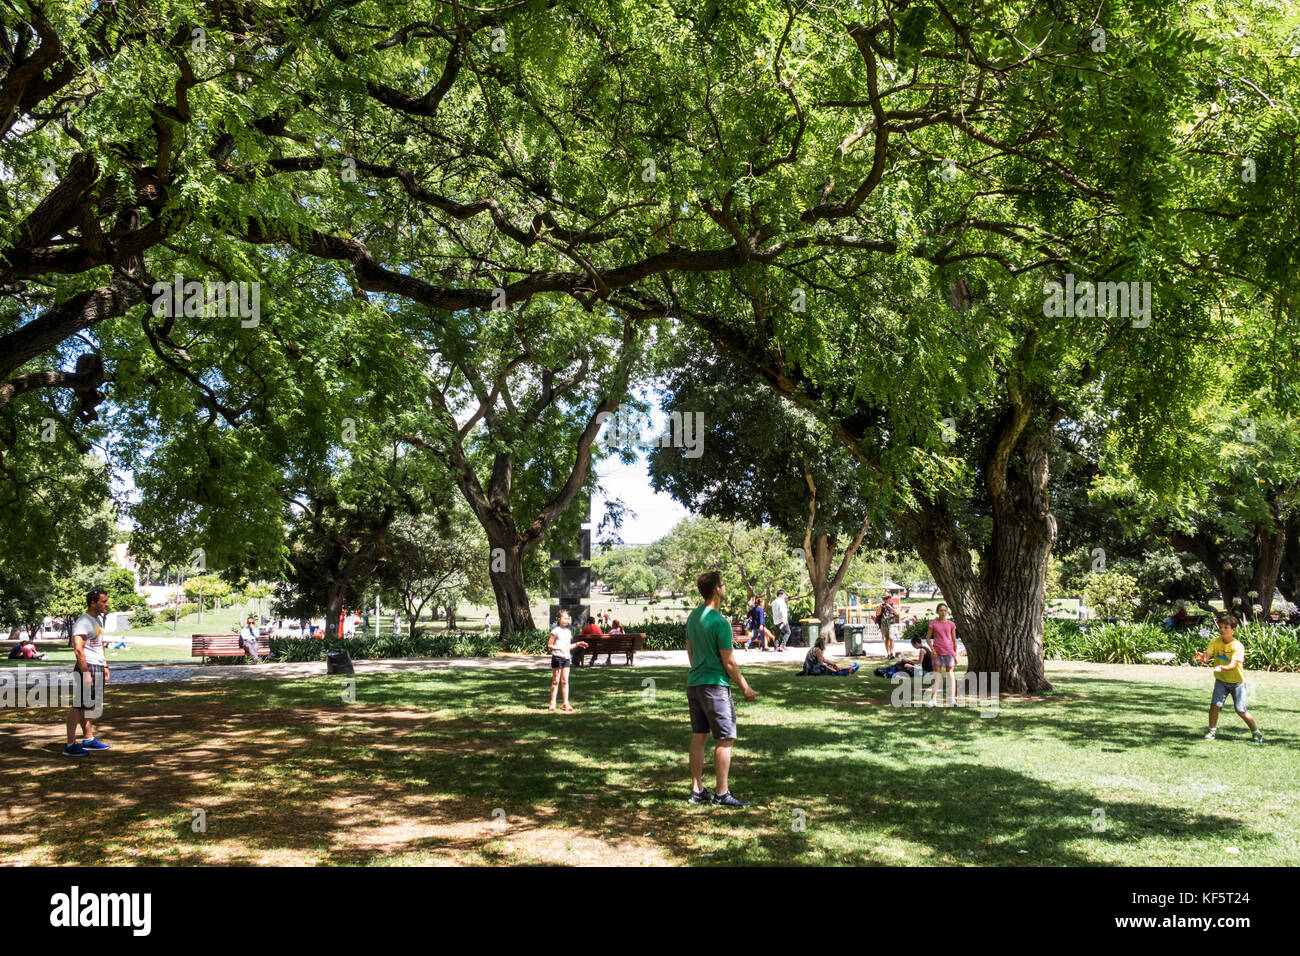 Lisbon Portugal Belem historic district Jardim Vasco da Gama urban park lawn trees man boy girl Hispanic family - Stock Image